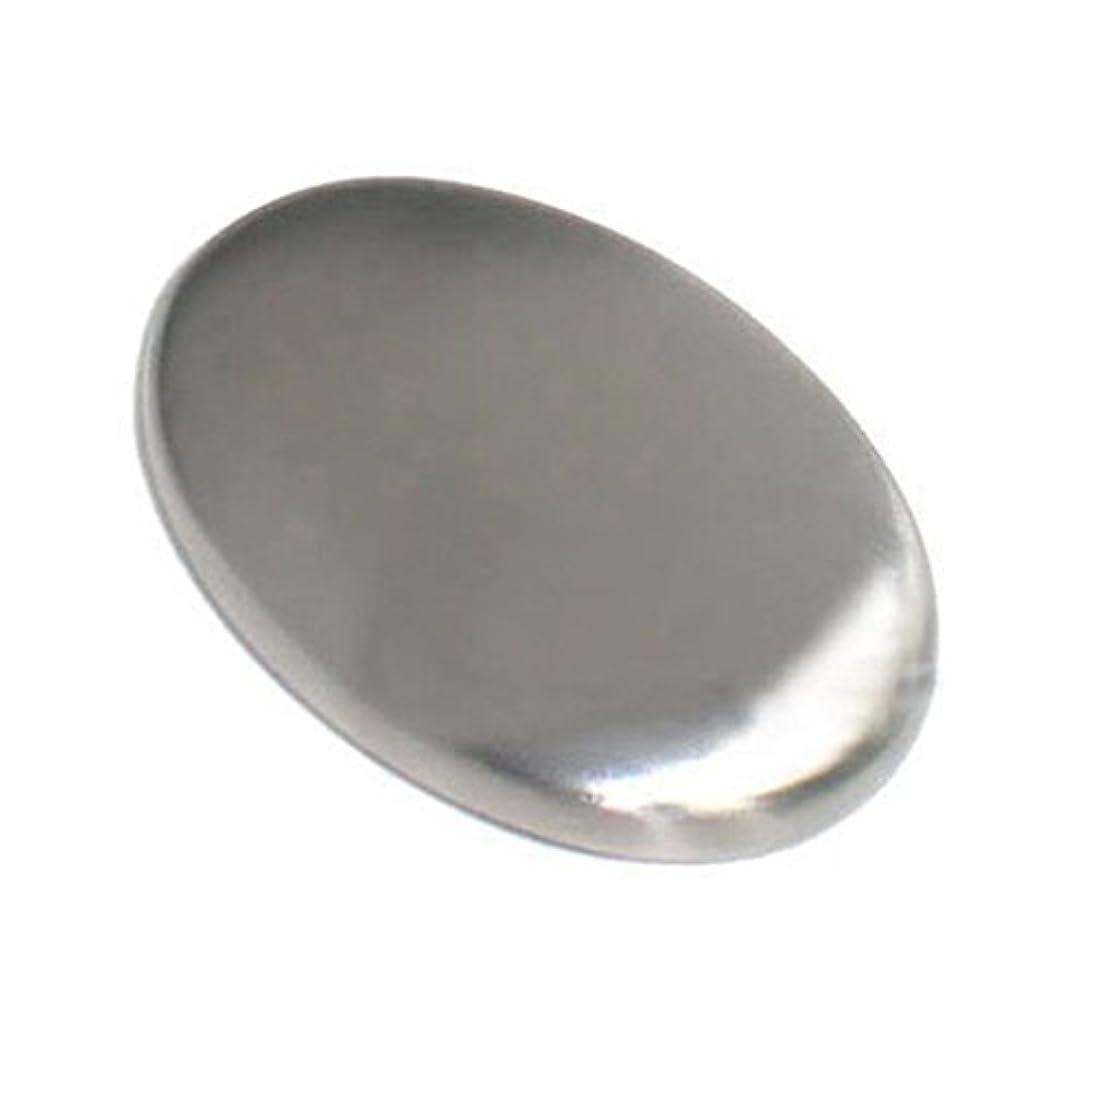 Suika Suika 石鹸 魚臭 ねぎやニンニクのにおい 魚介のにおい 異臭を取り除く ステンレスソープ においとりソープ臭い取り 実用的な台所用具 スチールソープ永遠の香り 台座付き